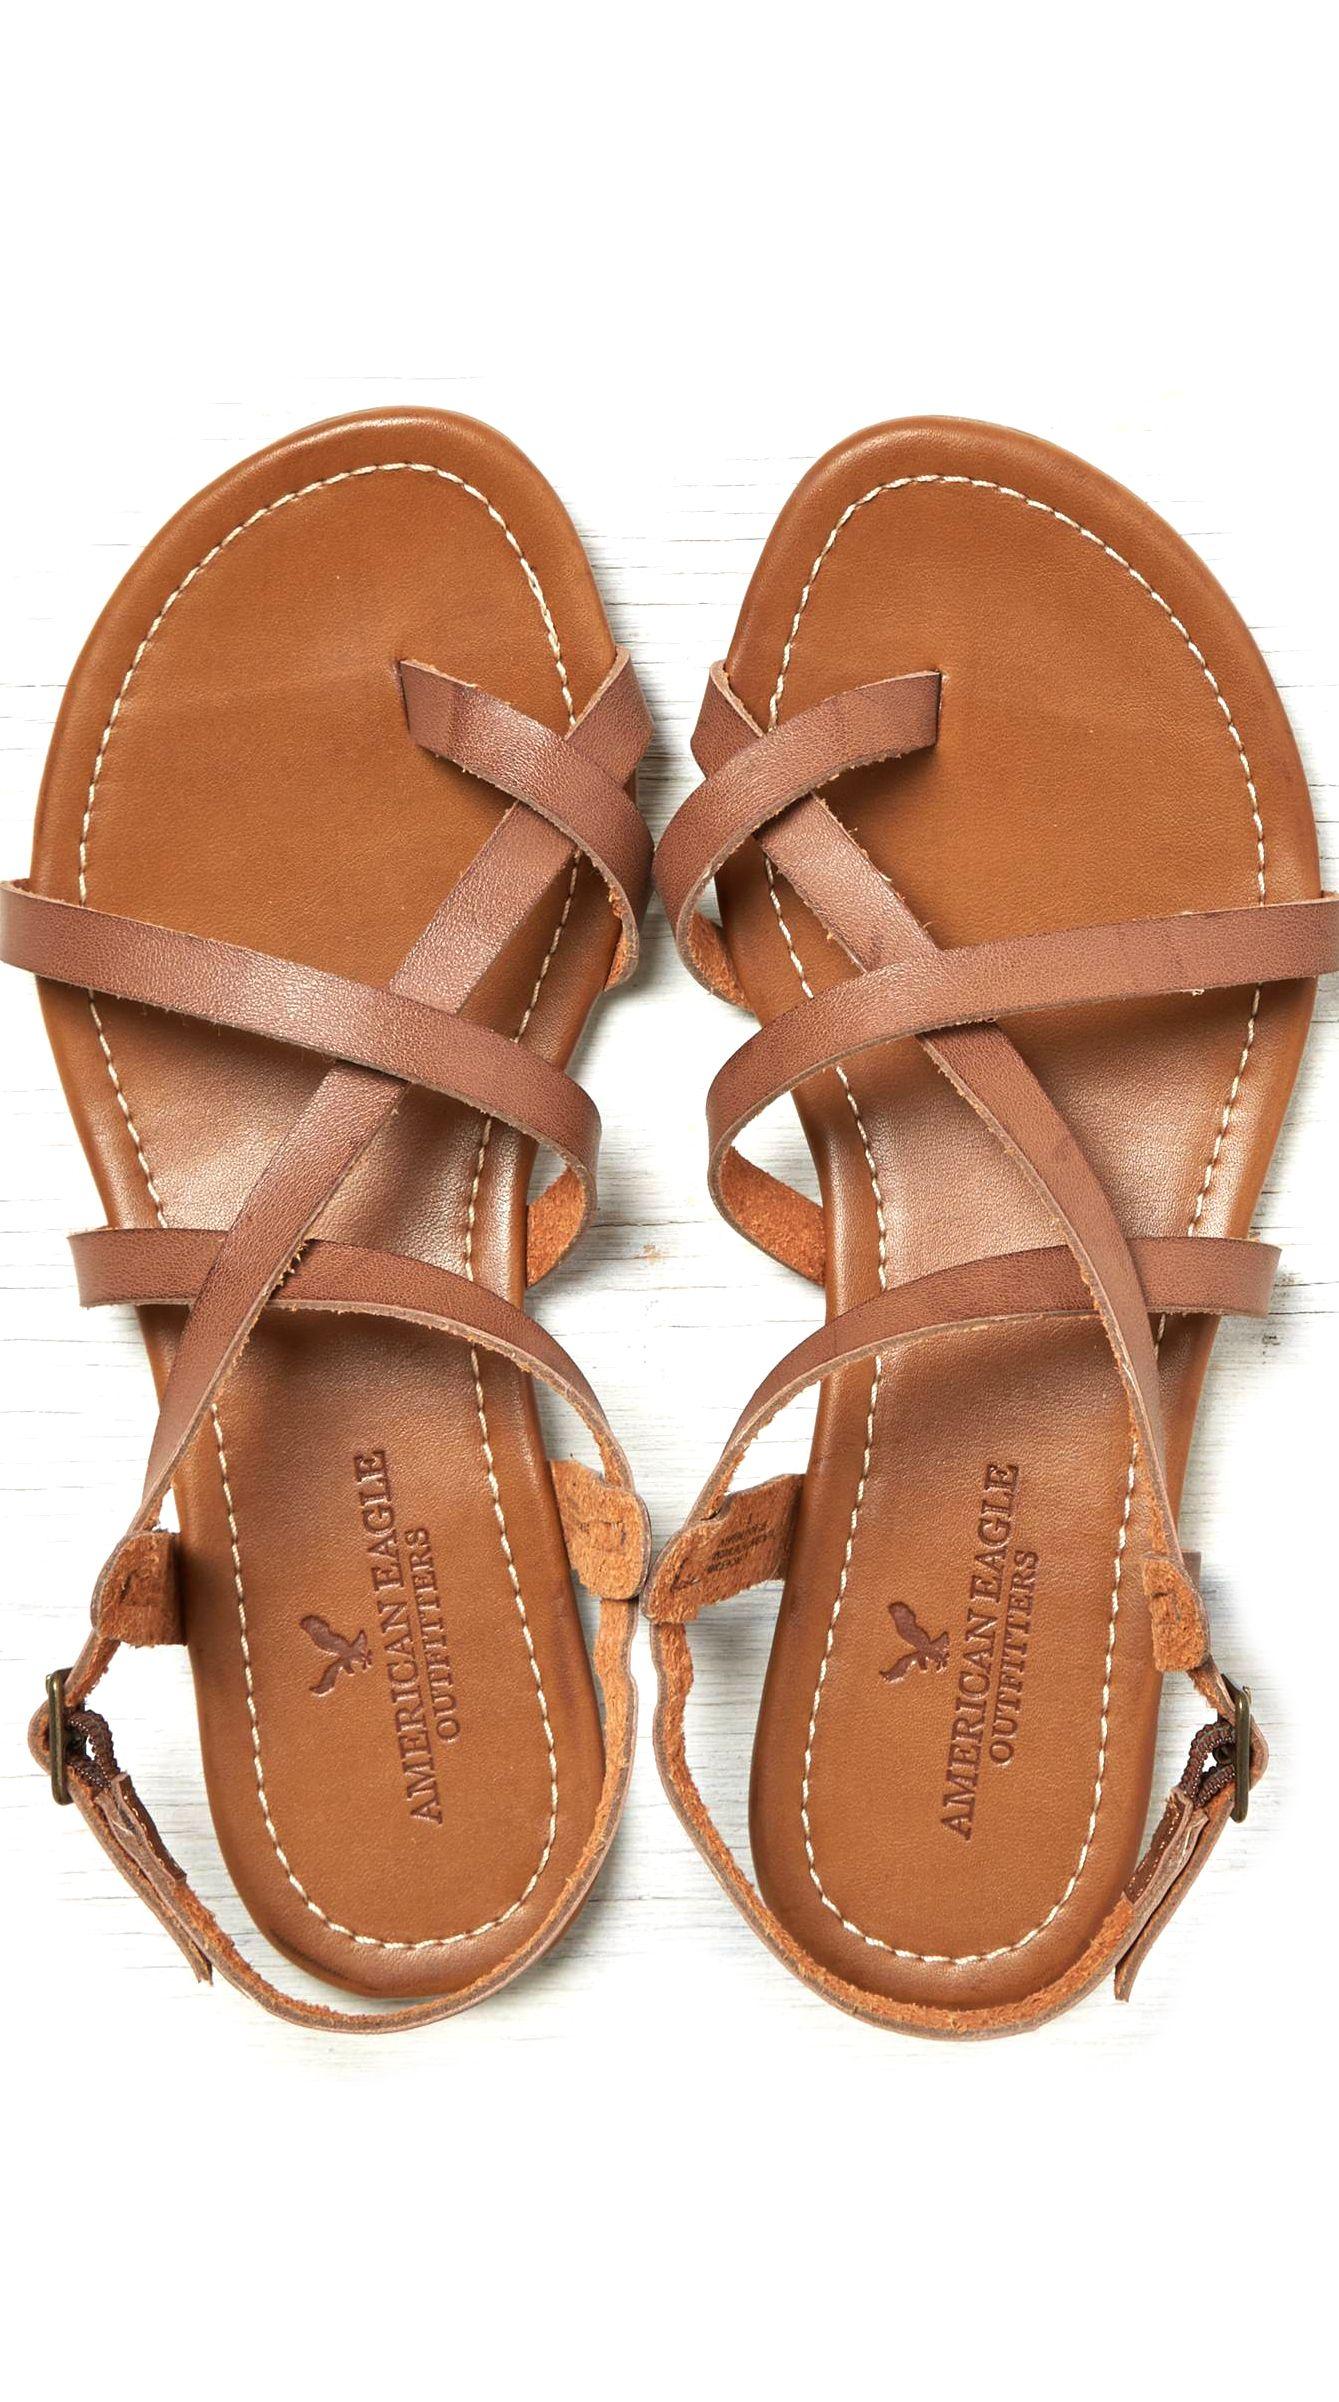 b2e4c255fae Criss cross sandals